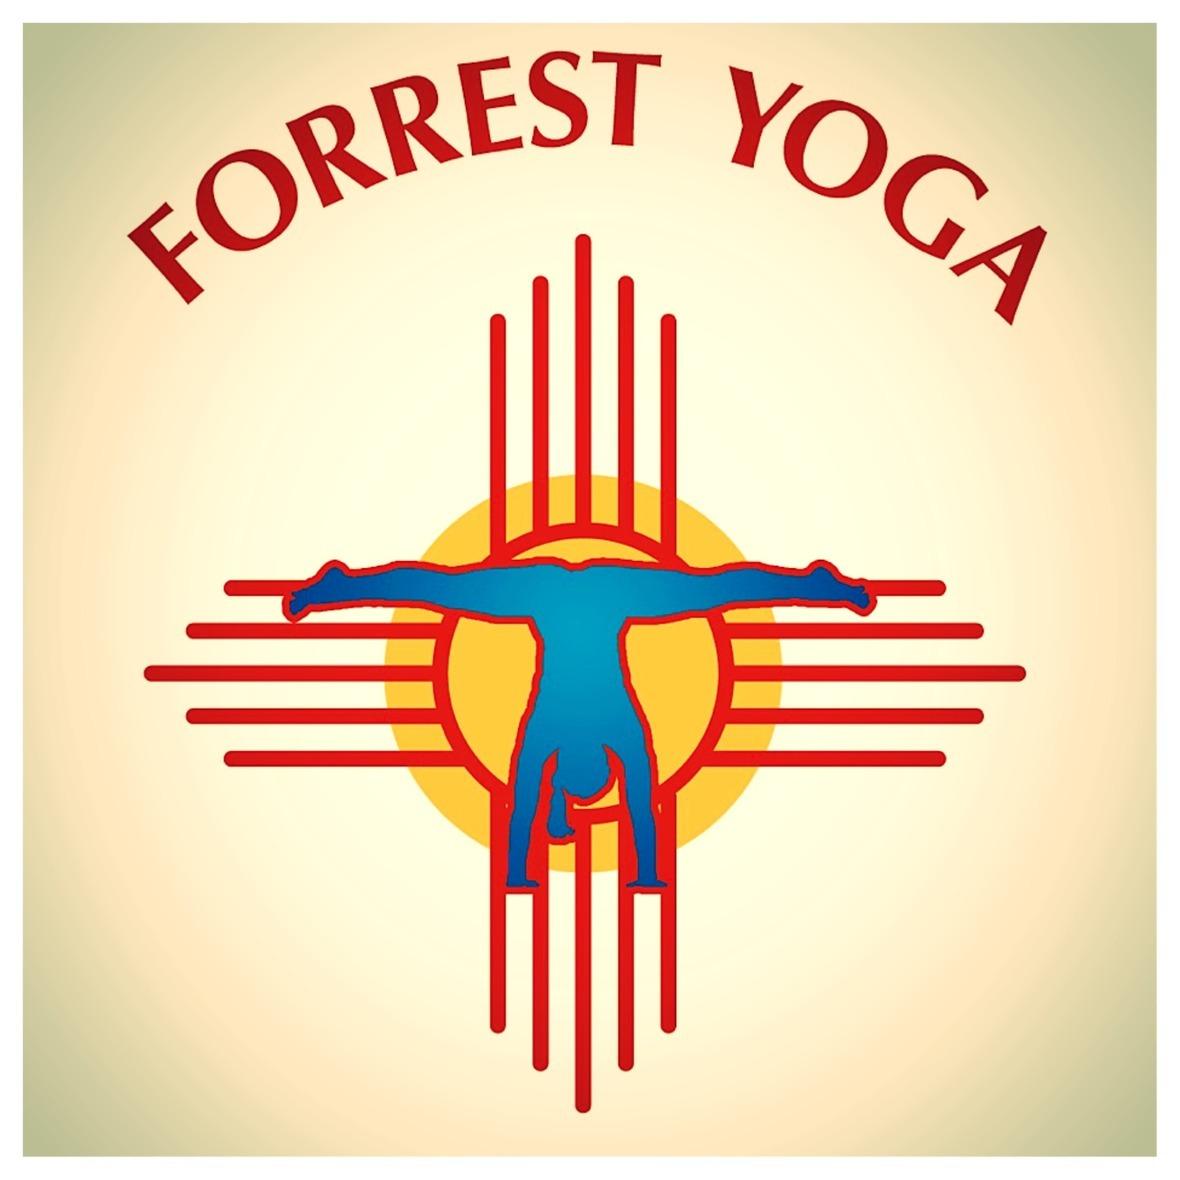 3 Forrest Yoga